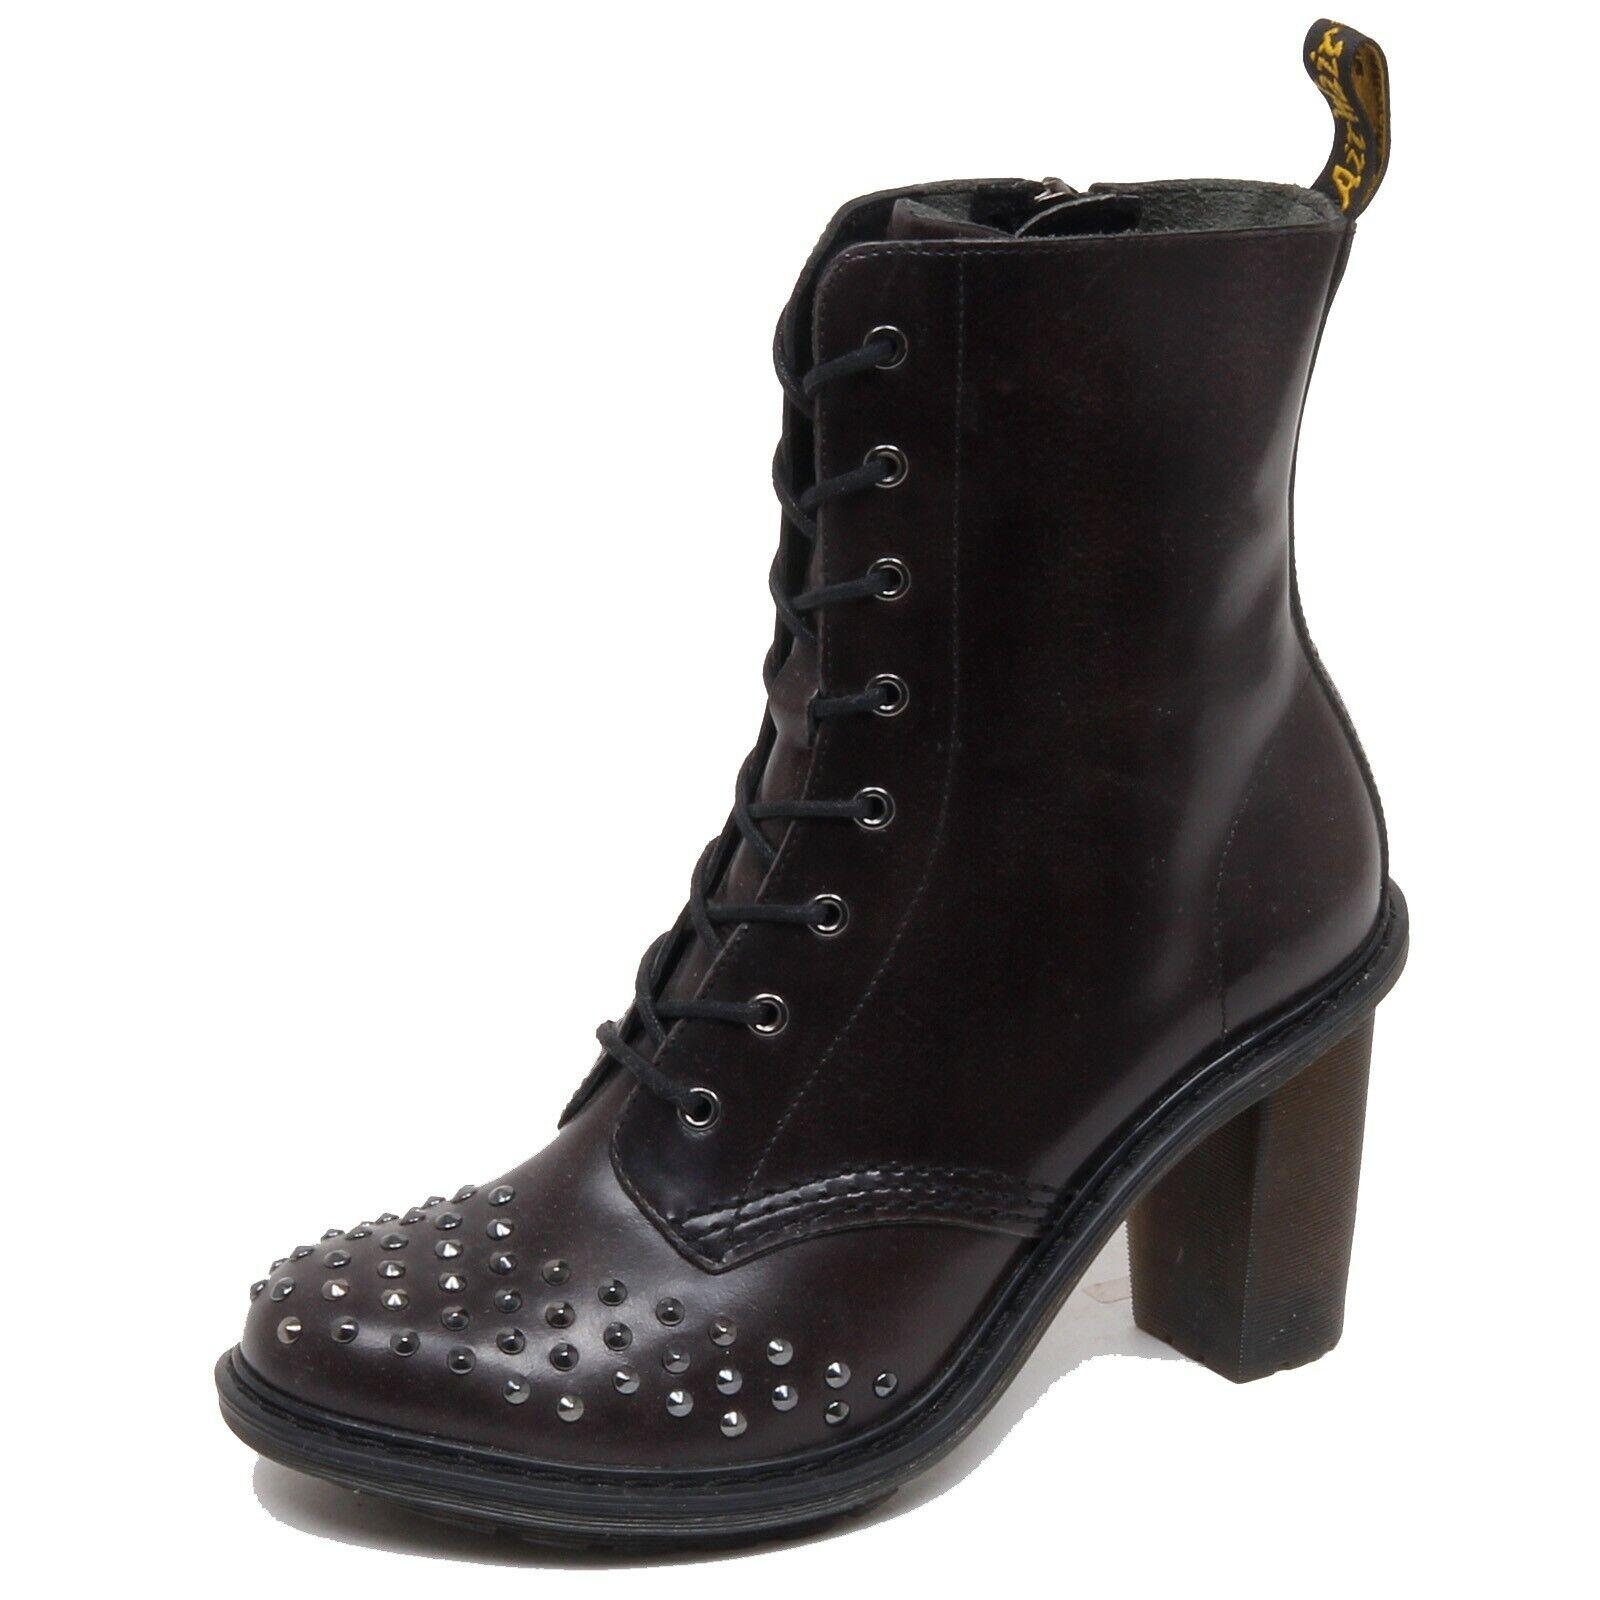 F3600 (no Box) stivaletto mujer dark marrón Dr. Martens Zoie bota zapatos Woman